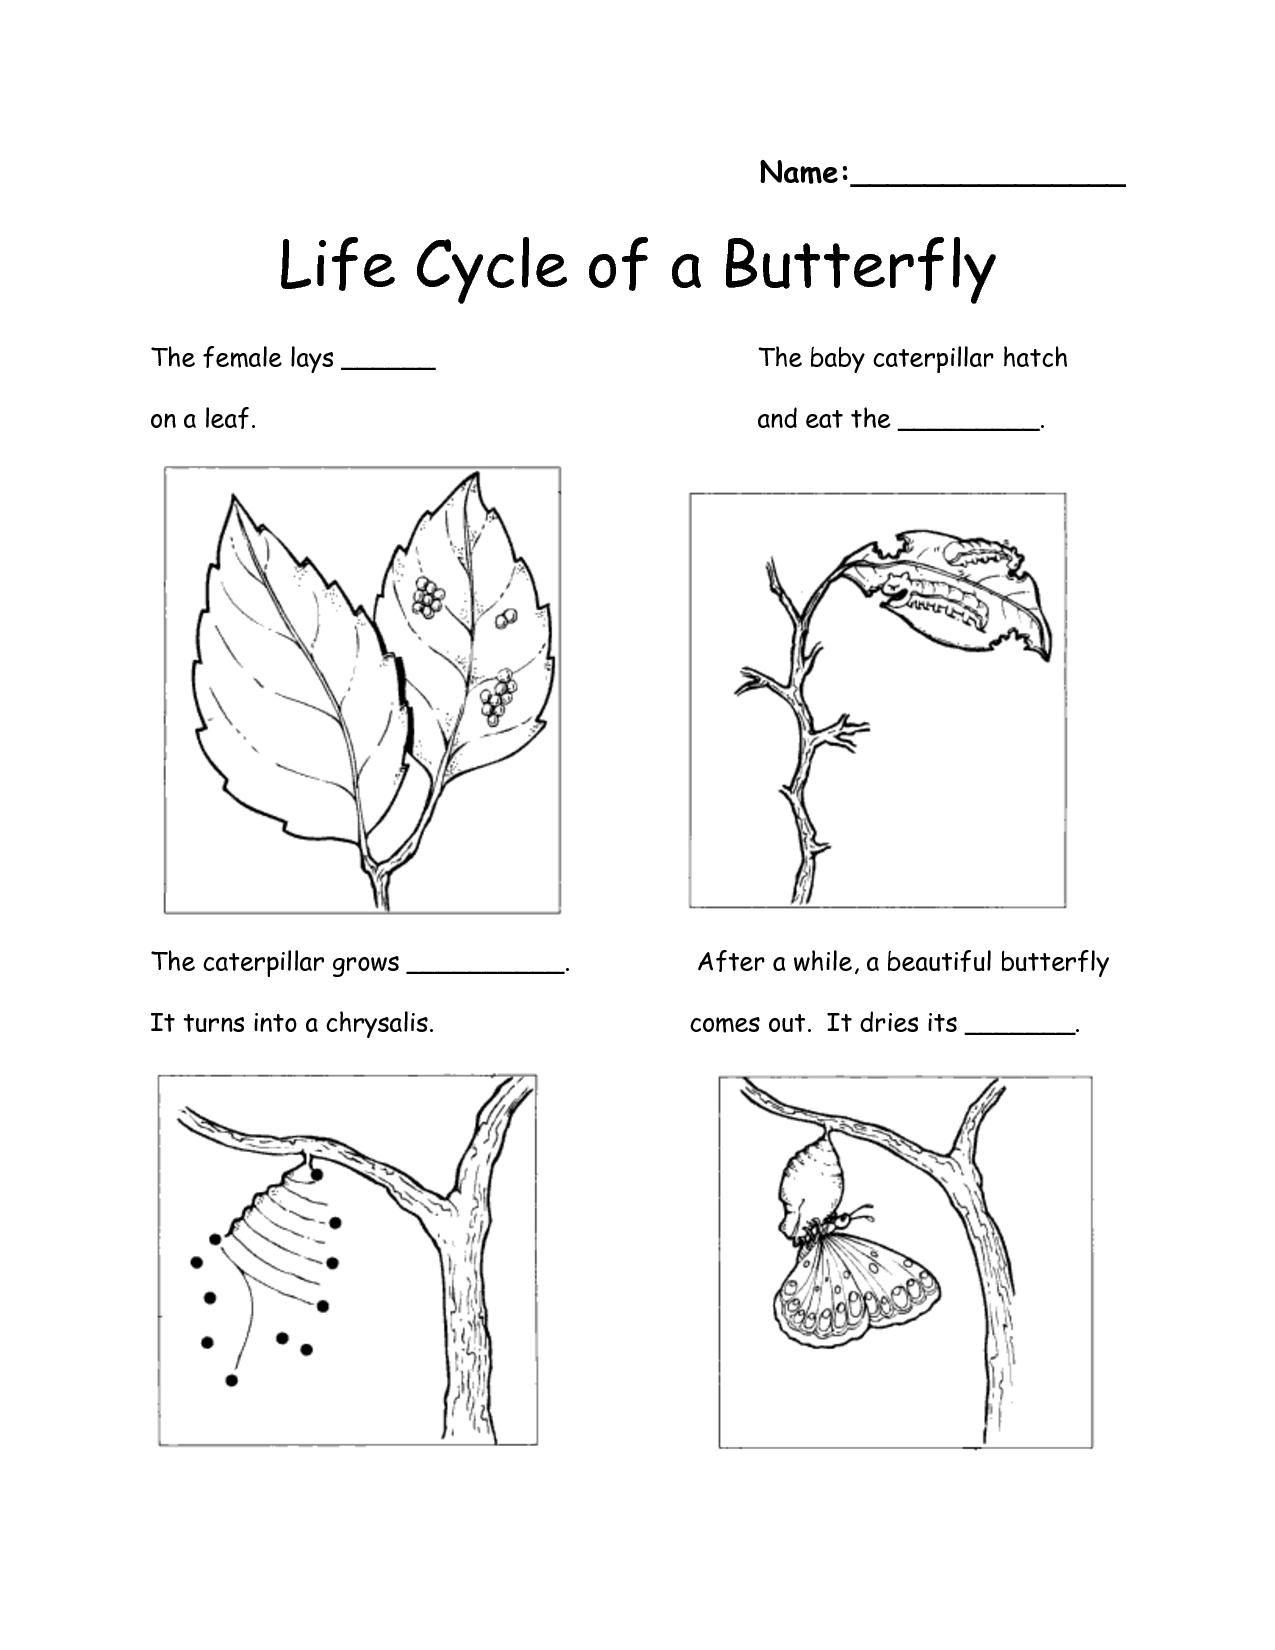 Free Printable Worksheets For Science 2nd Grade   kindergarten   Science  worksheets [ 1650 x 1275 Pixel ]